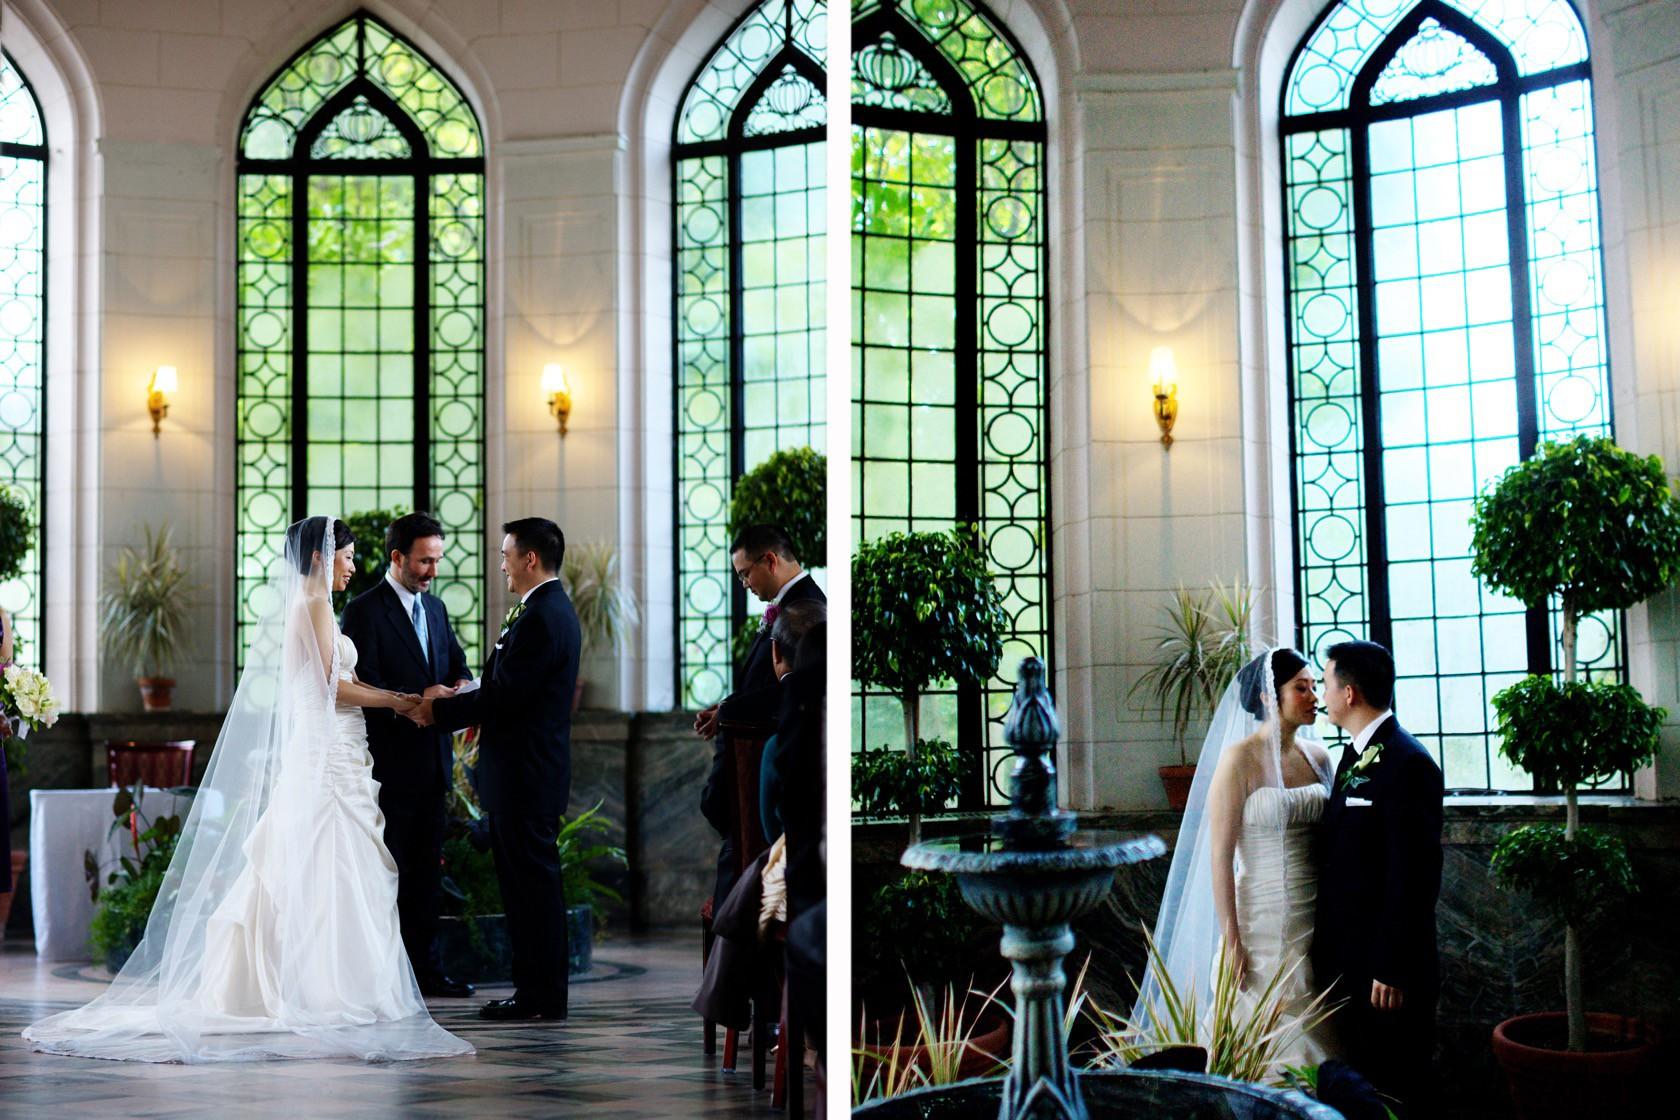 stephen sager photography 0006 fine art wedding photography